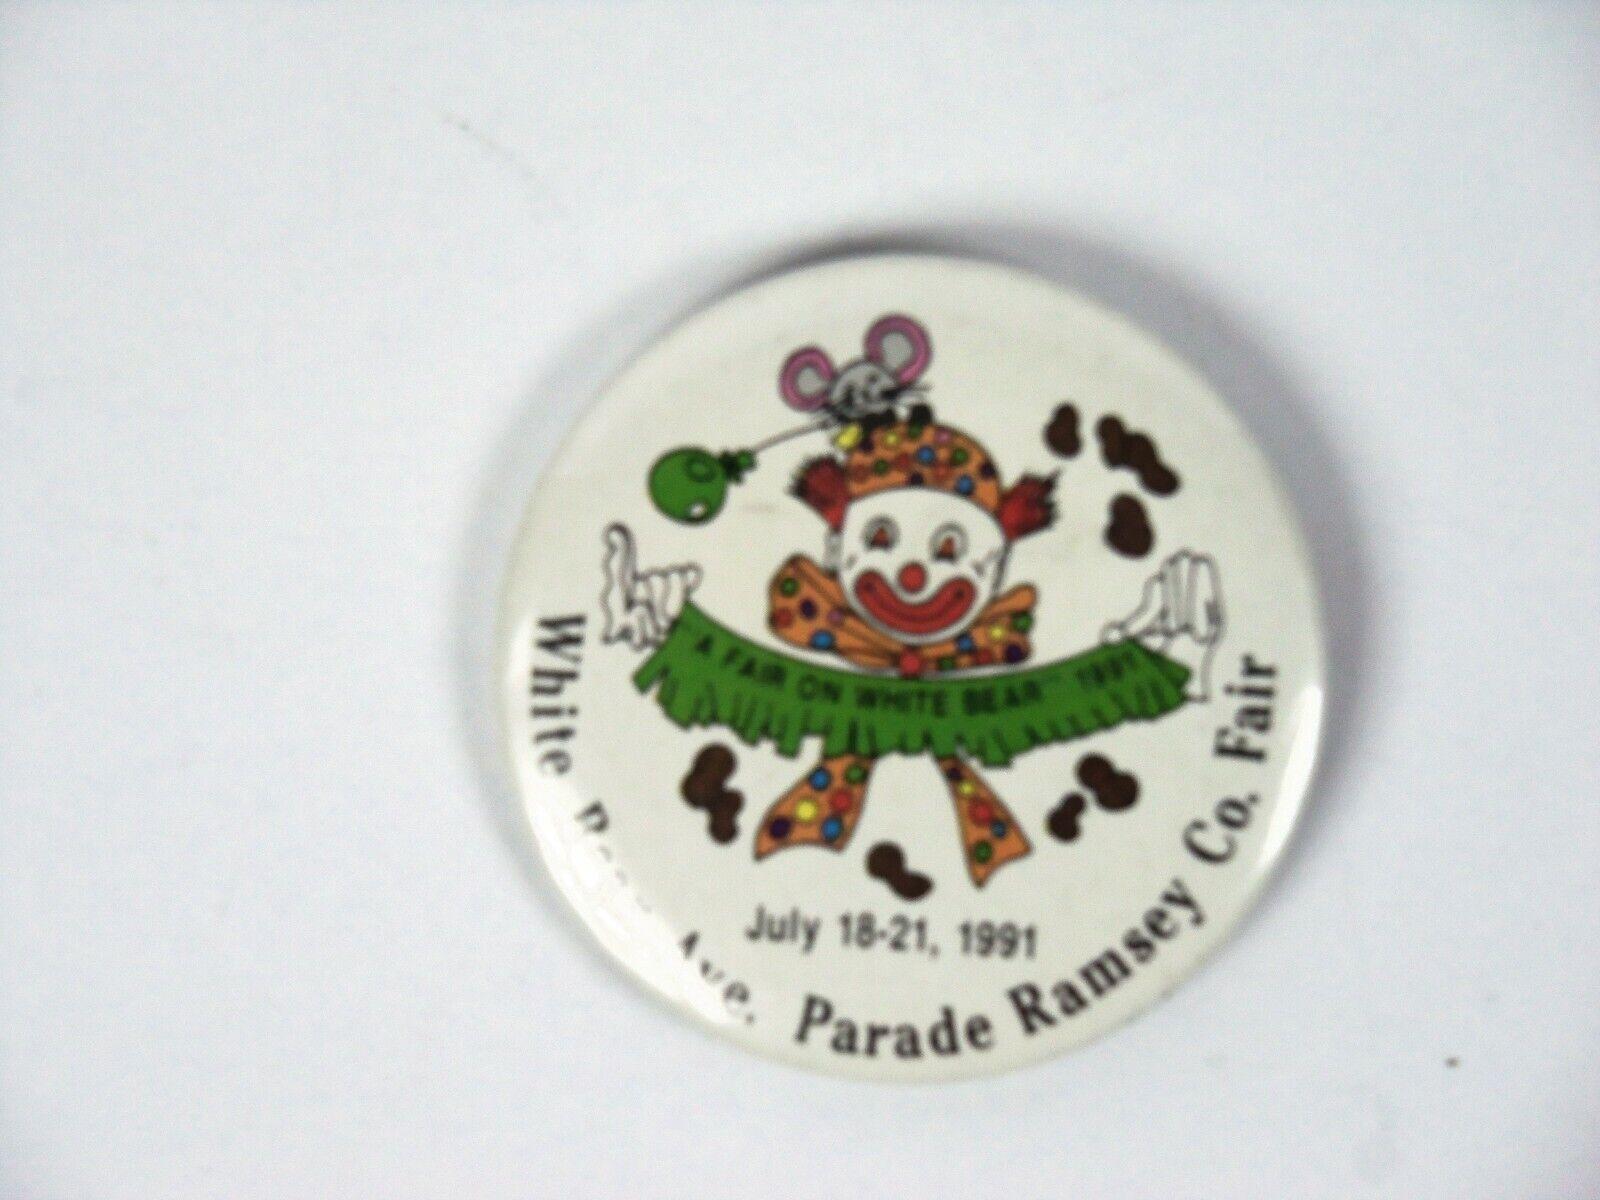 Vintage pinback pin FORT SIDNEY DAYS 1959 Custer and indian pic Sidney Nebraska